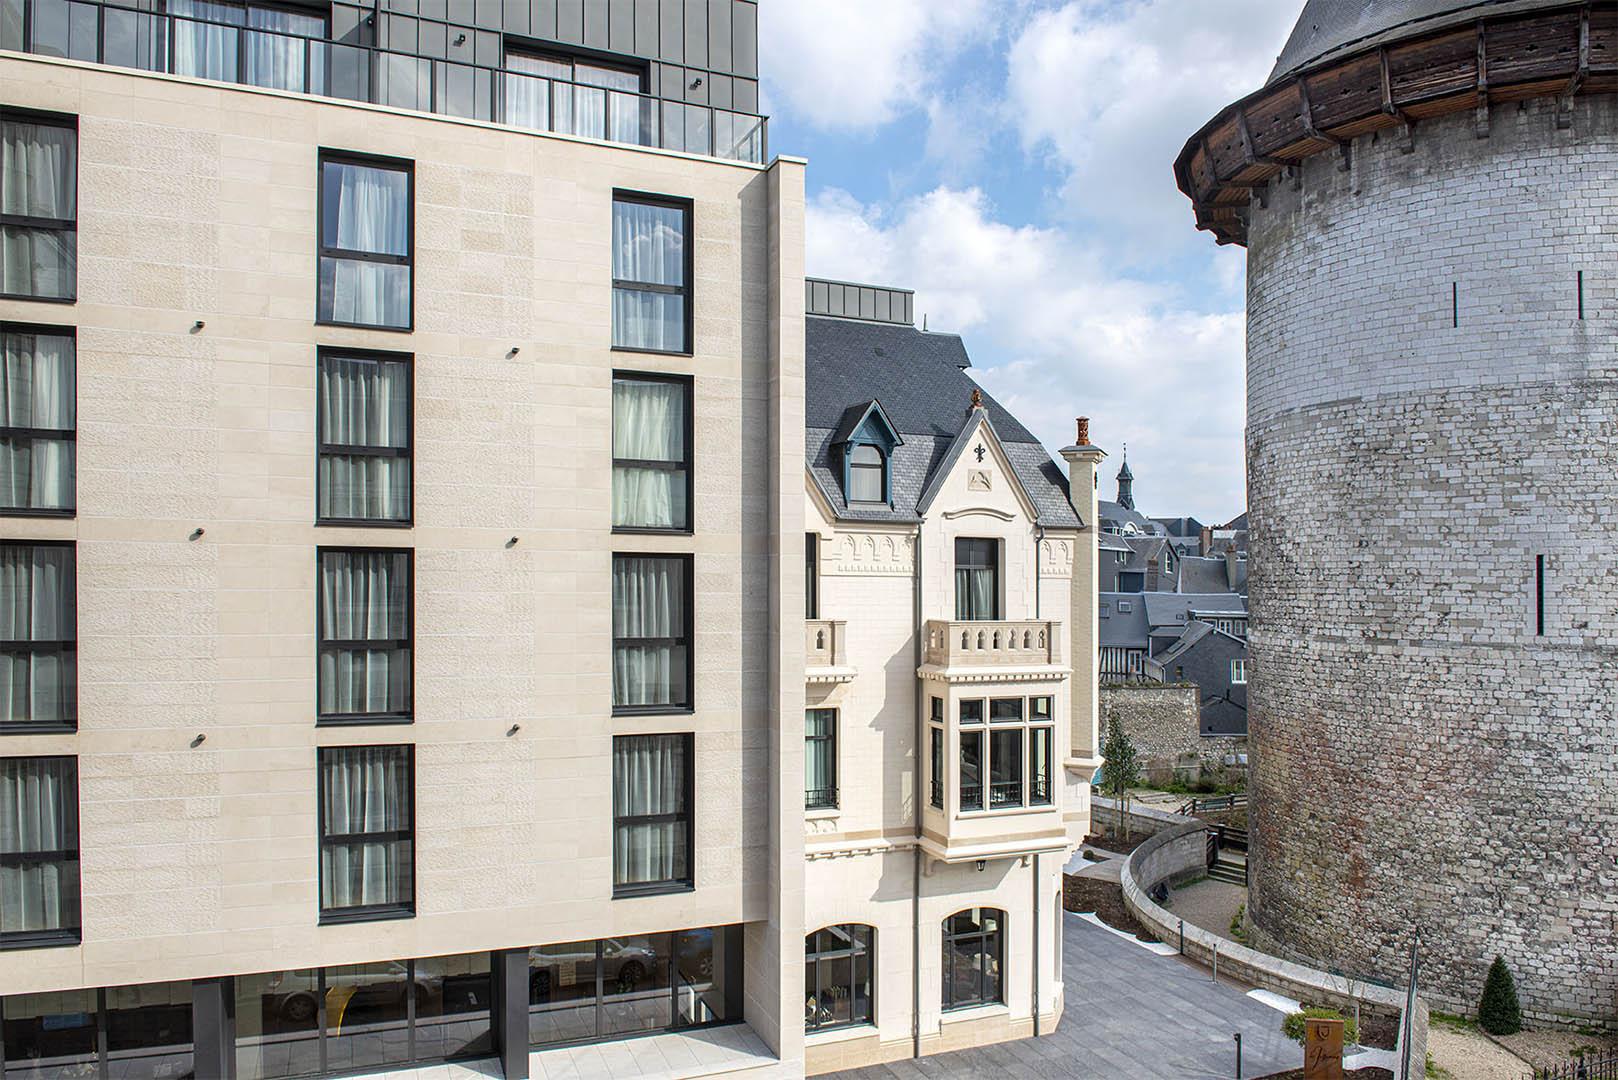 hotel-du-donjon-cba-rouen-francisvauban-8